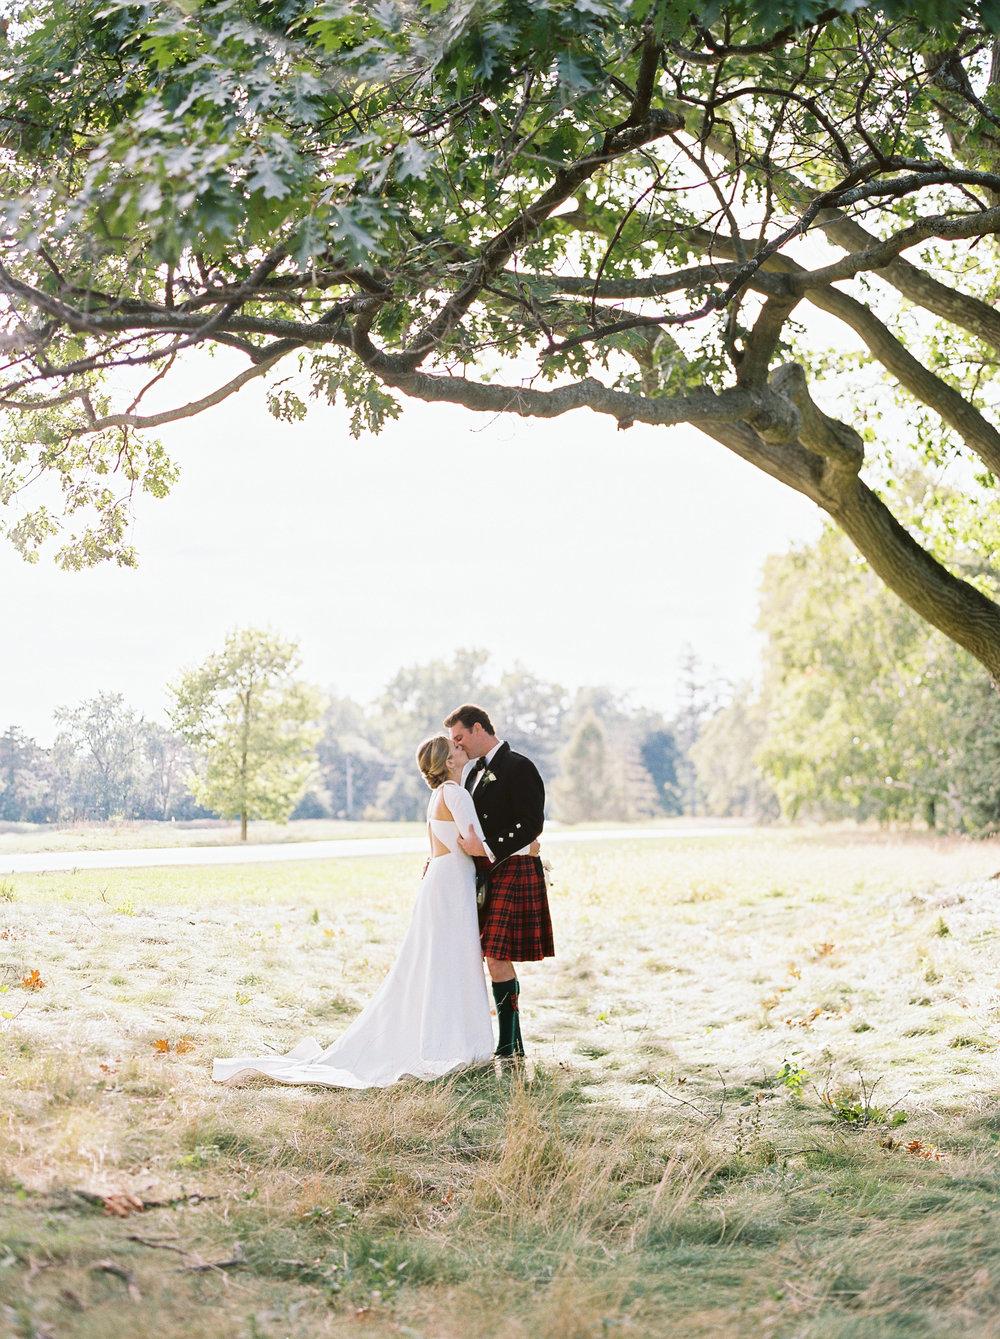 0258-Geneva-Ian-Wedding-Toronto Golf Club-When He Found Her-TorontoPhotographer.jpg